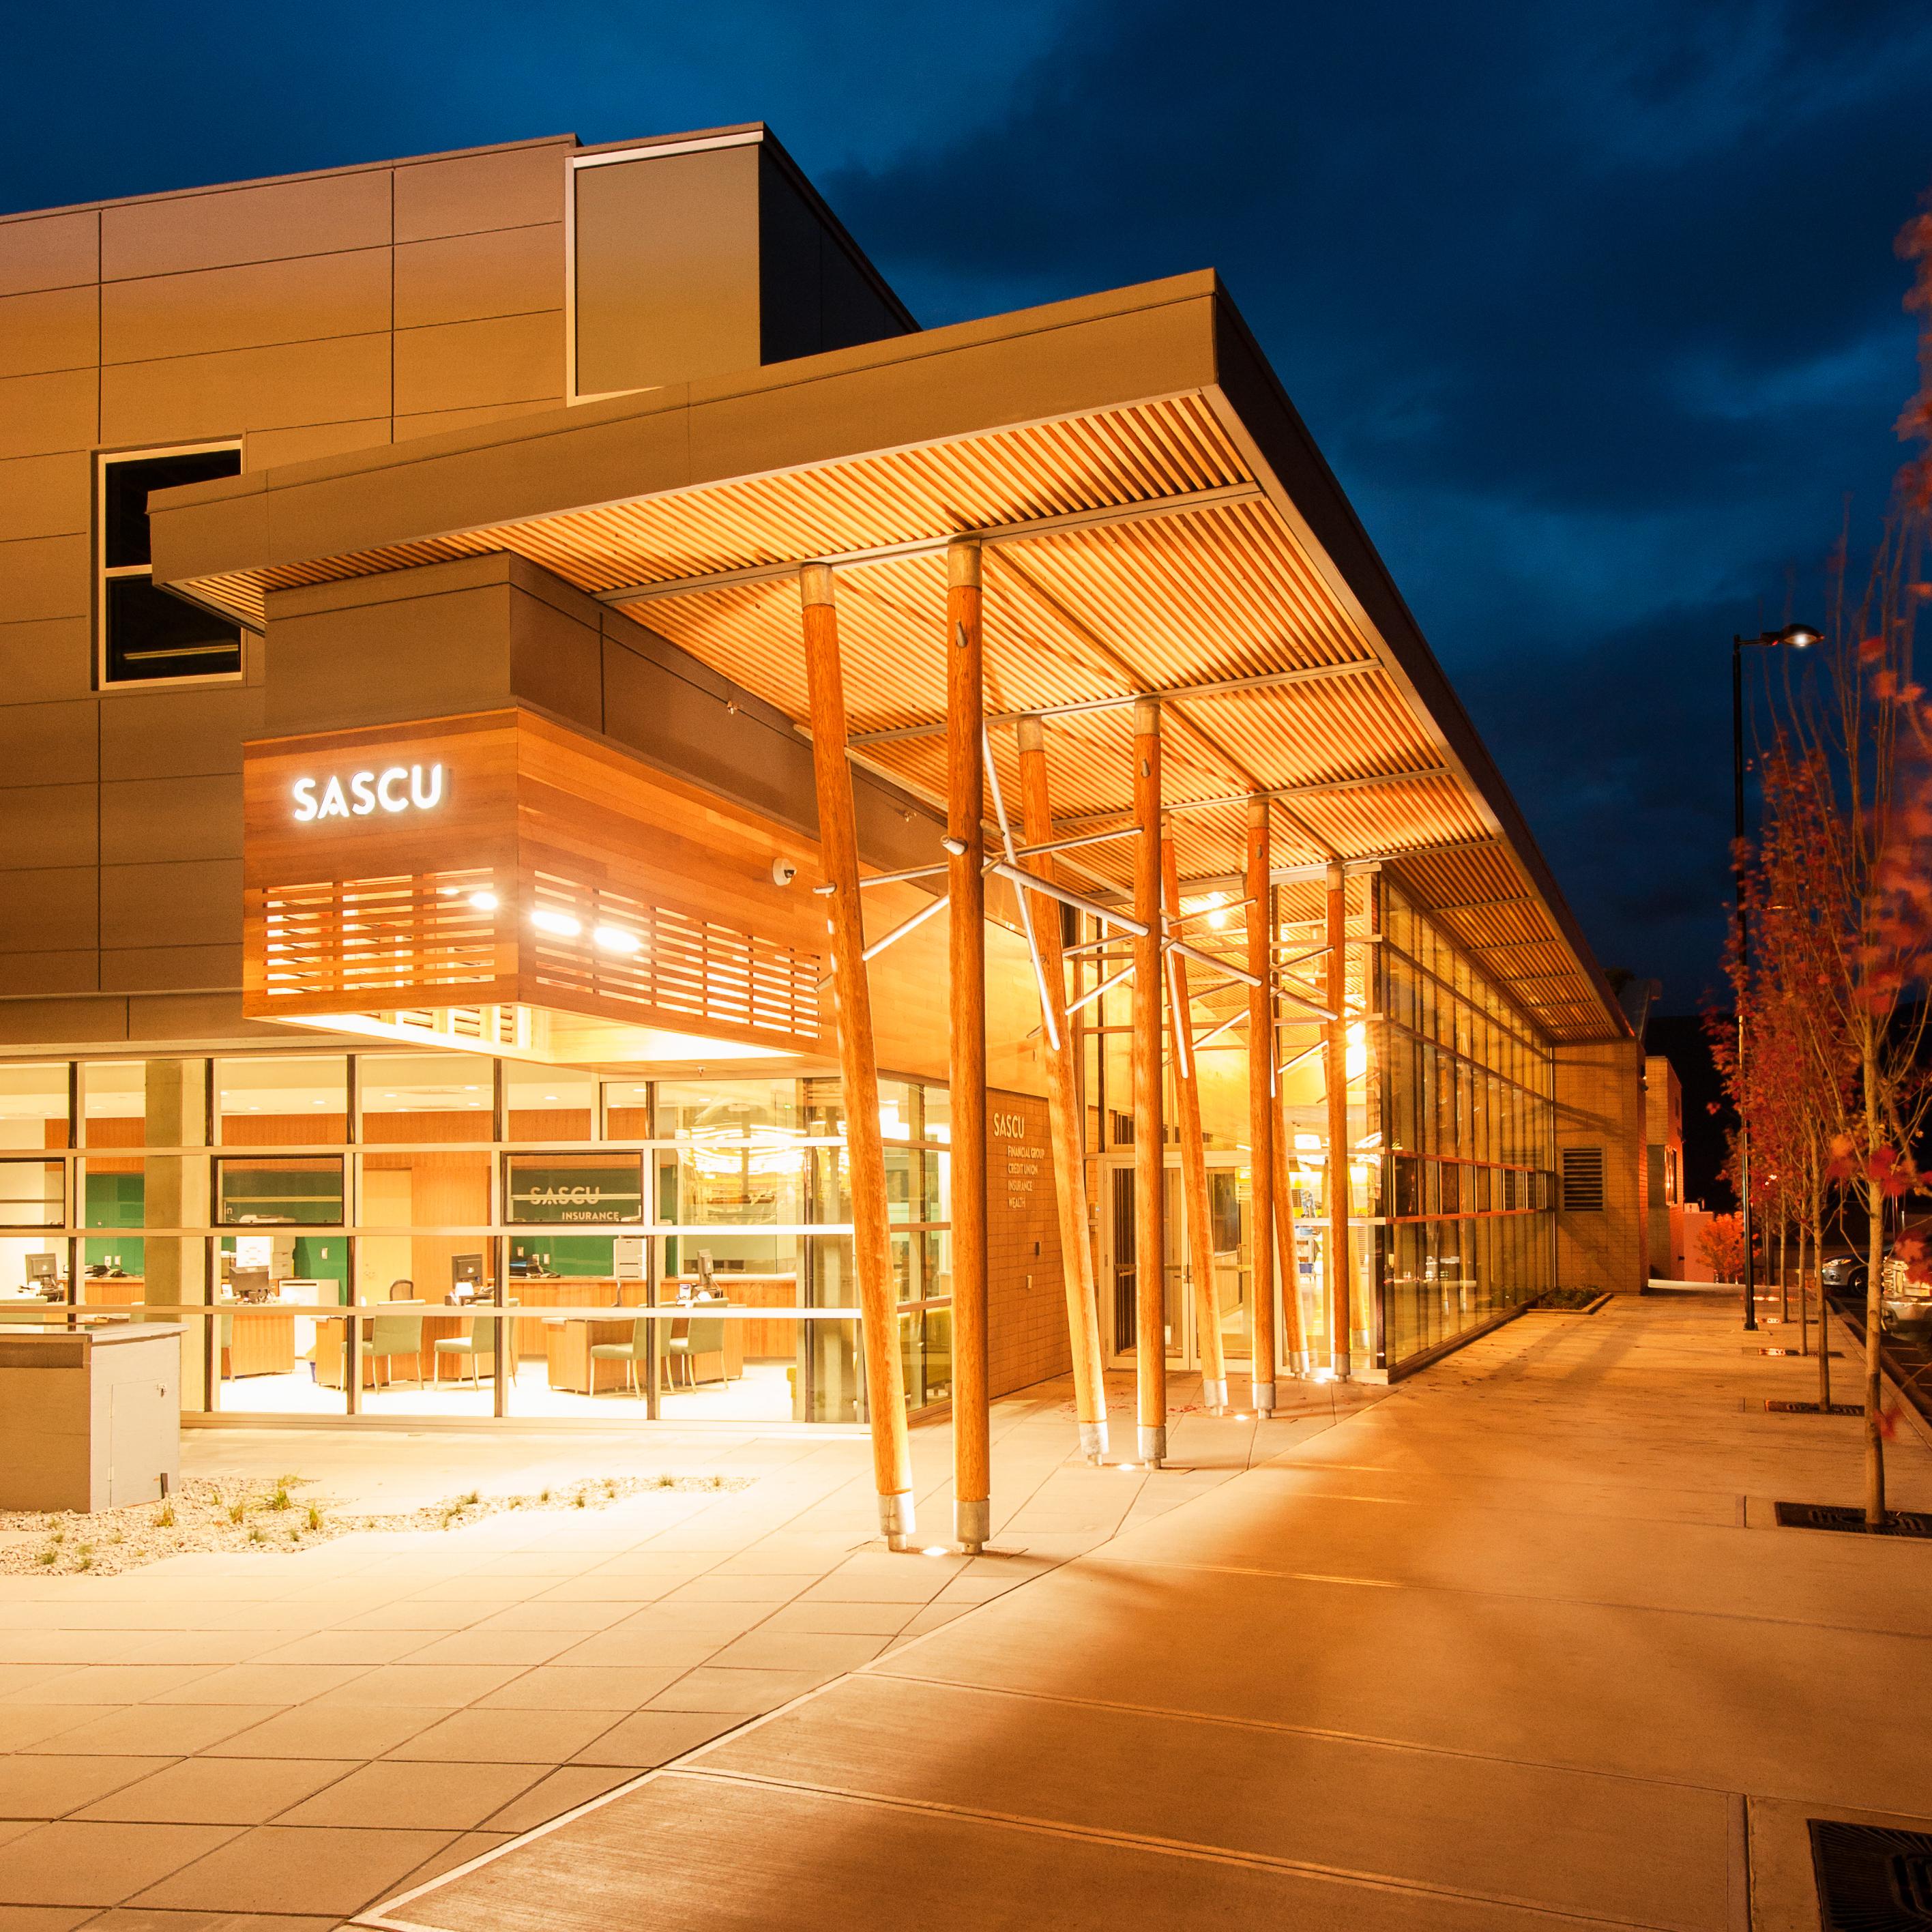 Interior Designers Of Canada: Salmon Arm Savings & Credit Union